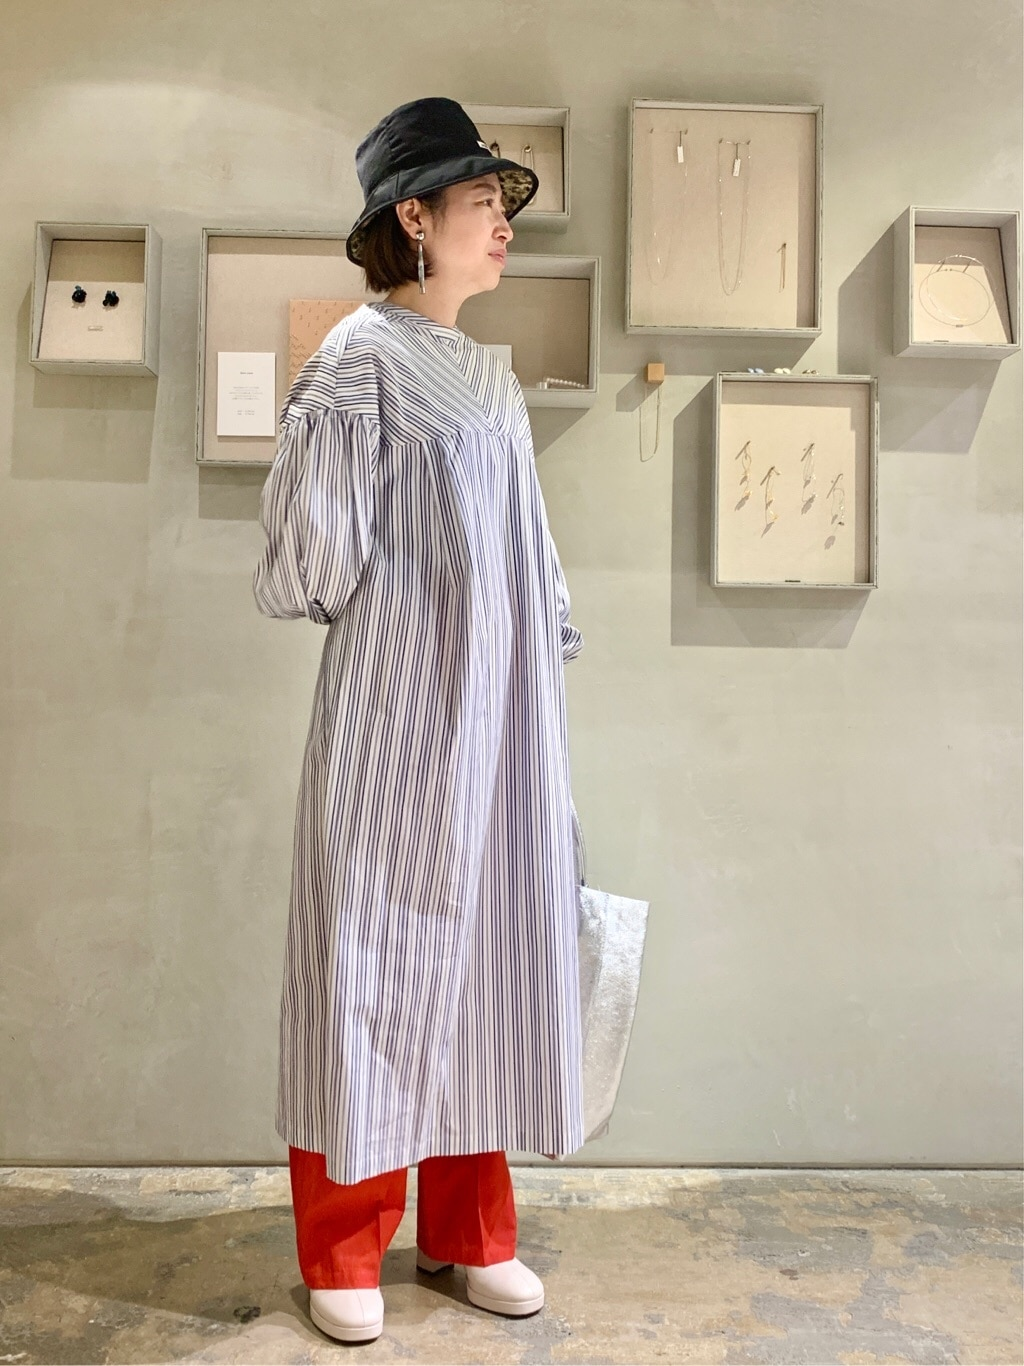 note et silence. ルミネ新宿 身長:155cm 2021.01.12